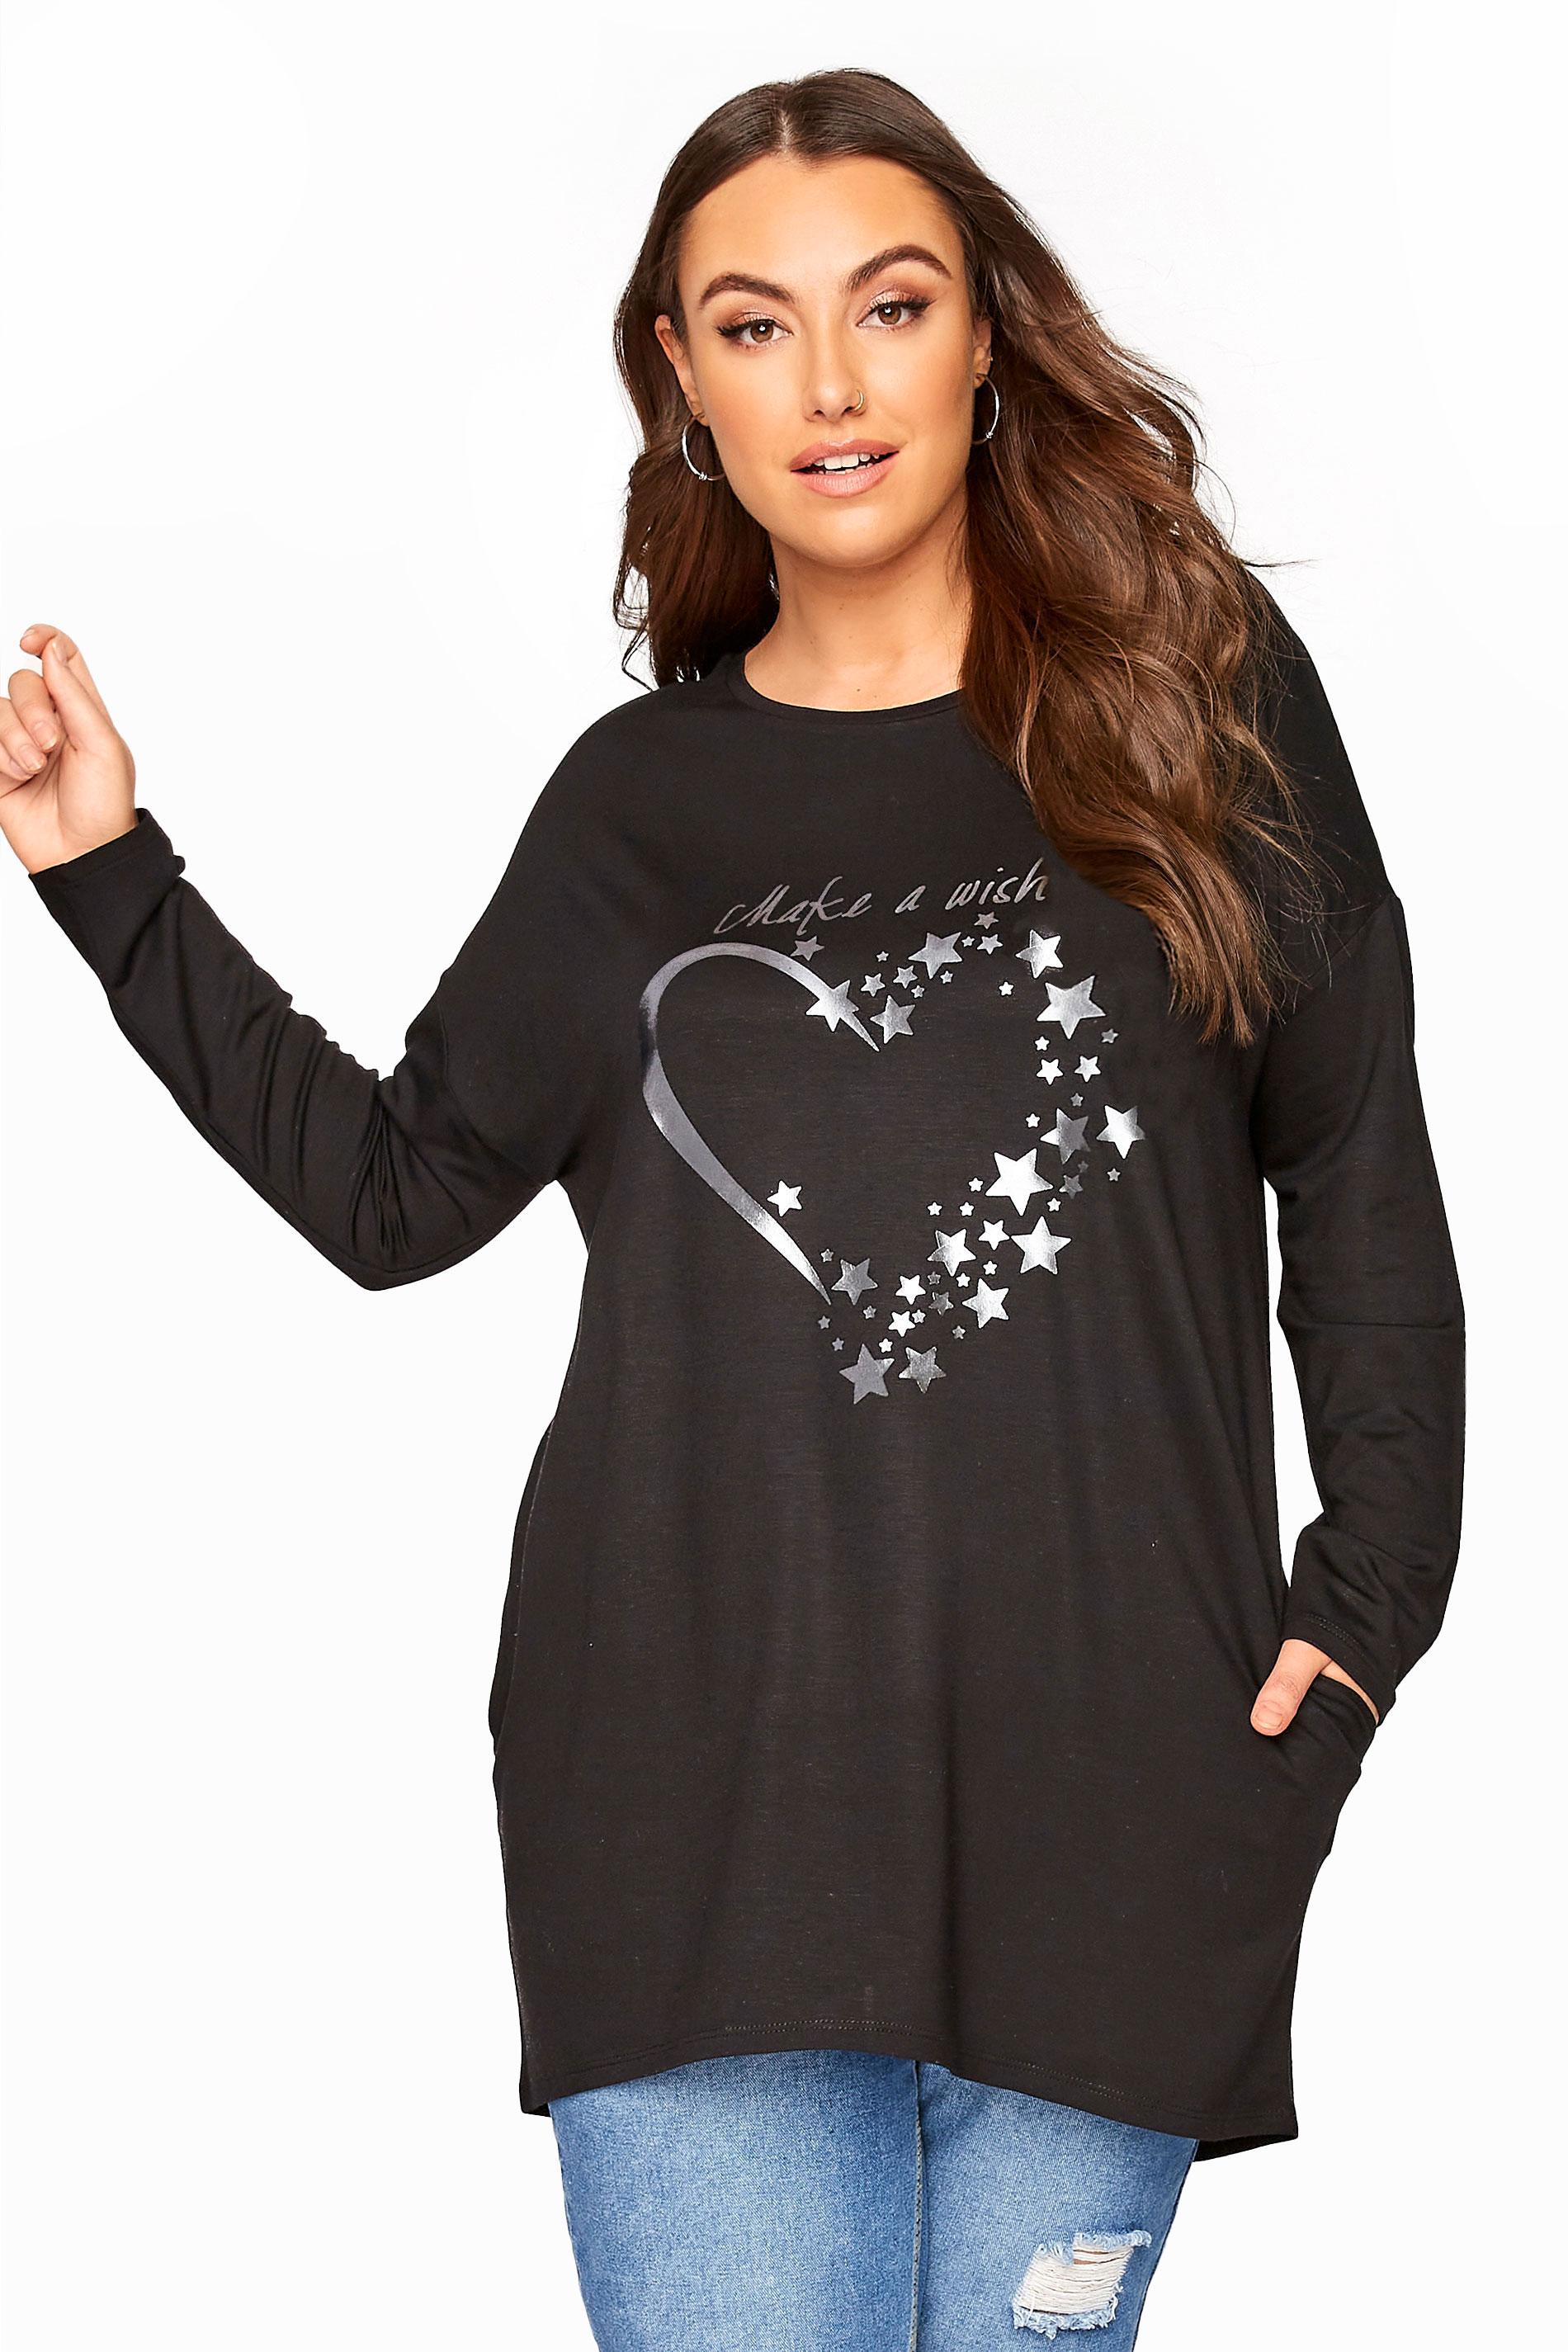 Black Silver Heart Slogan Sweatshirt_e23c.jpg